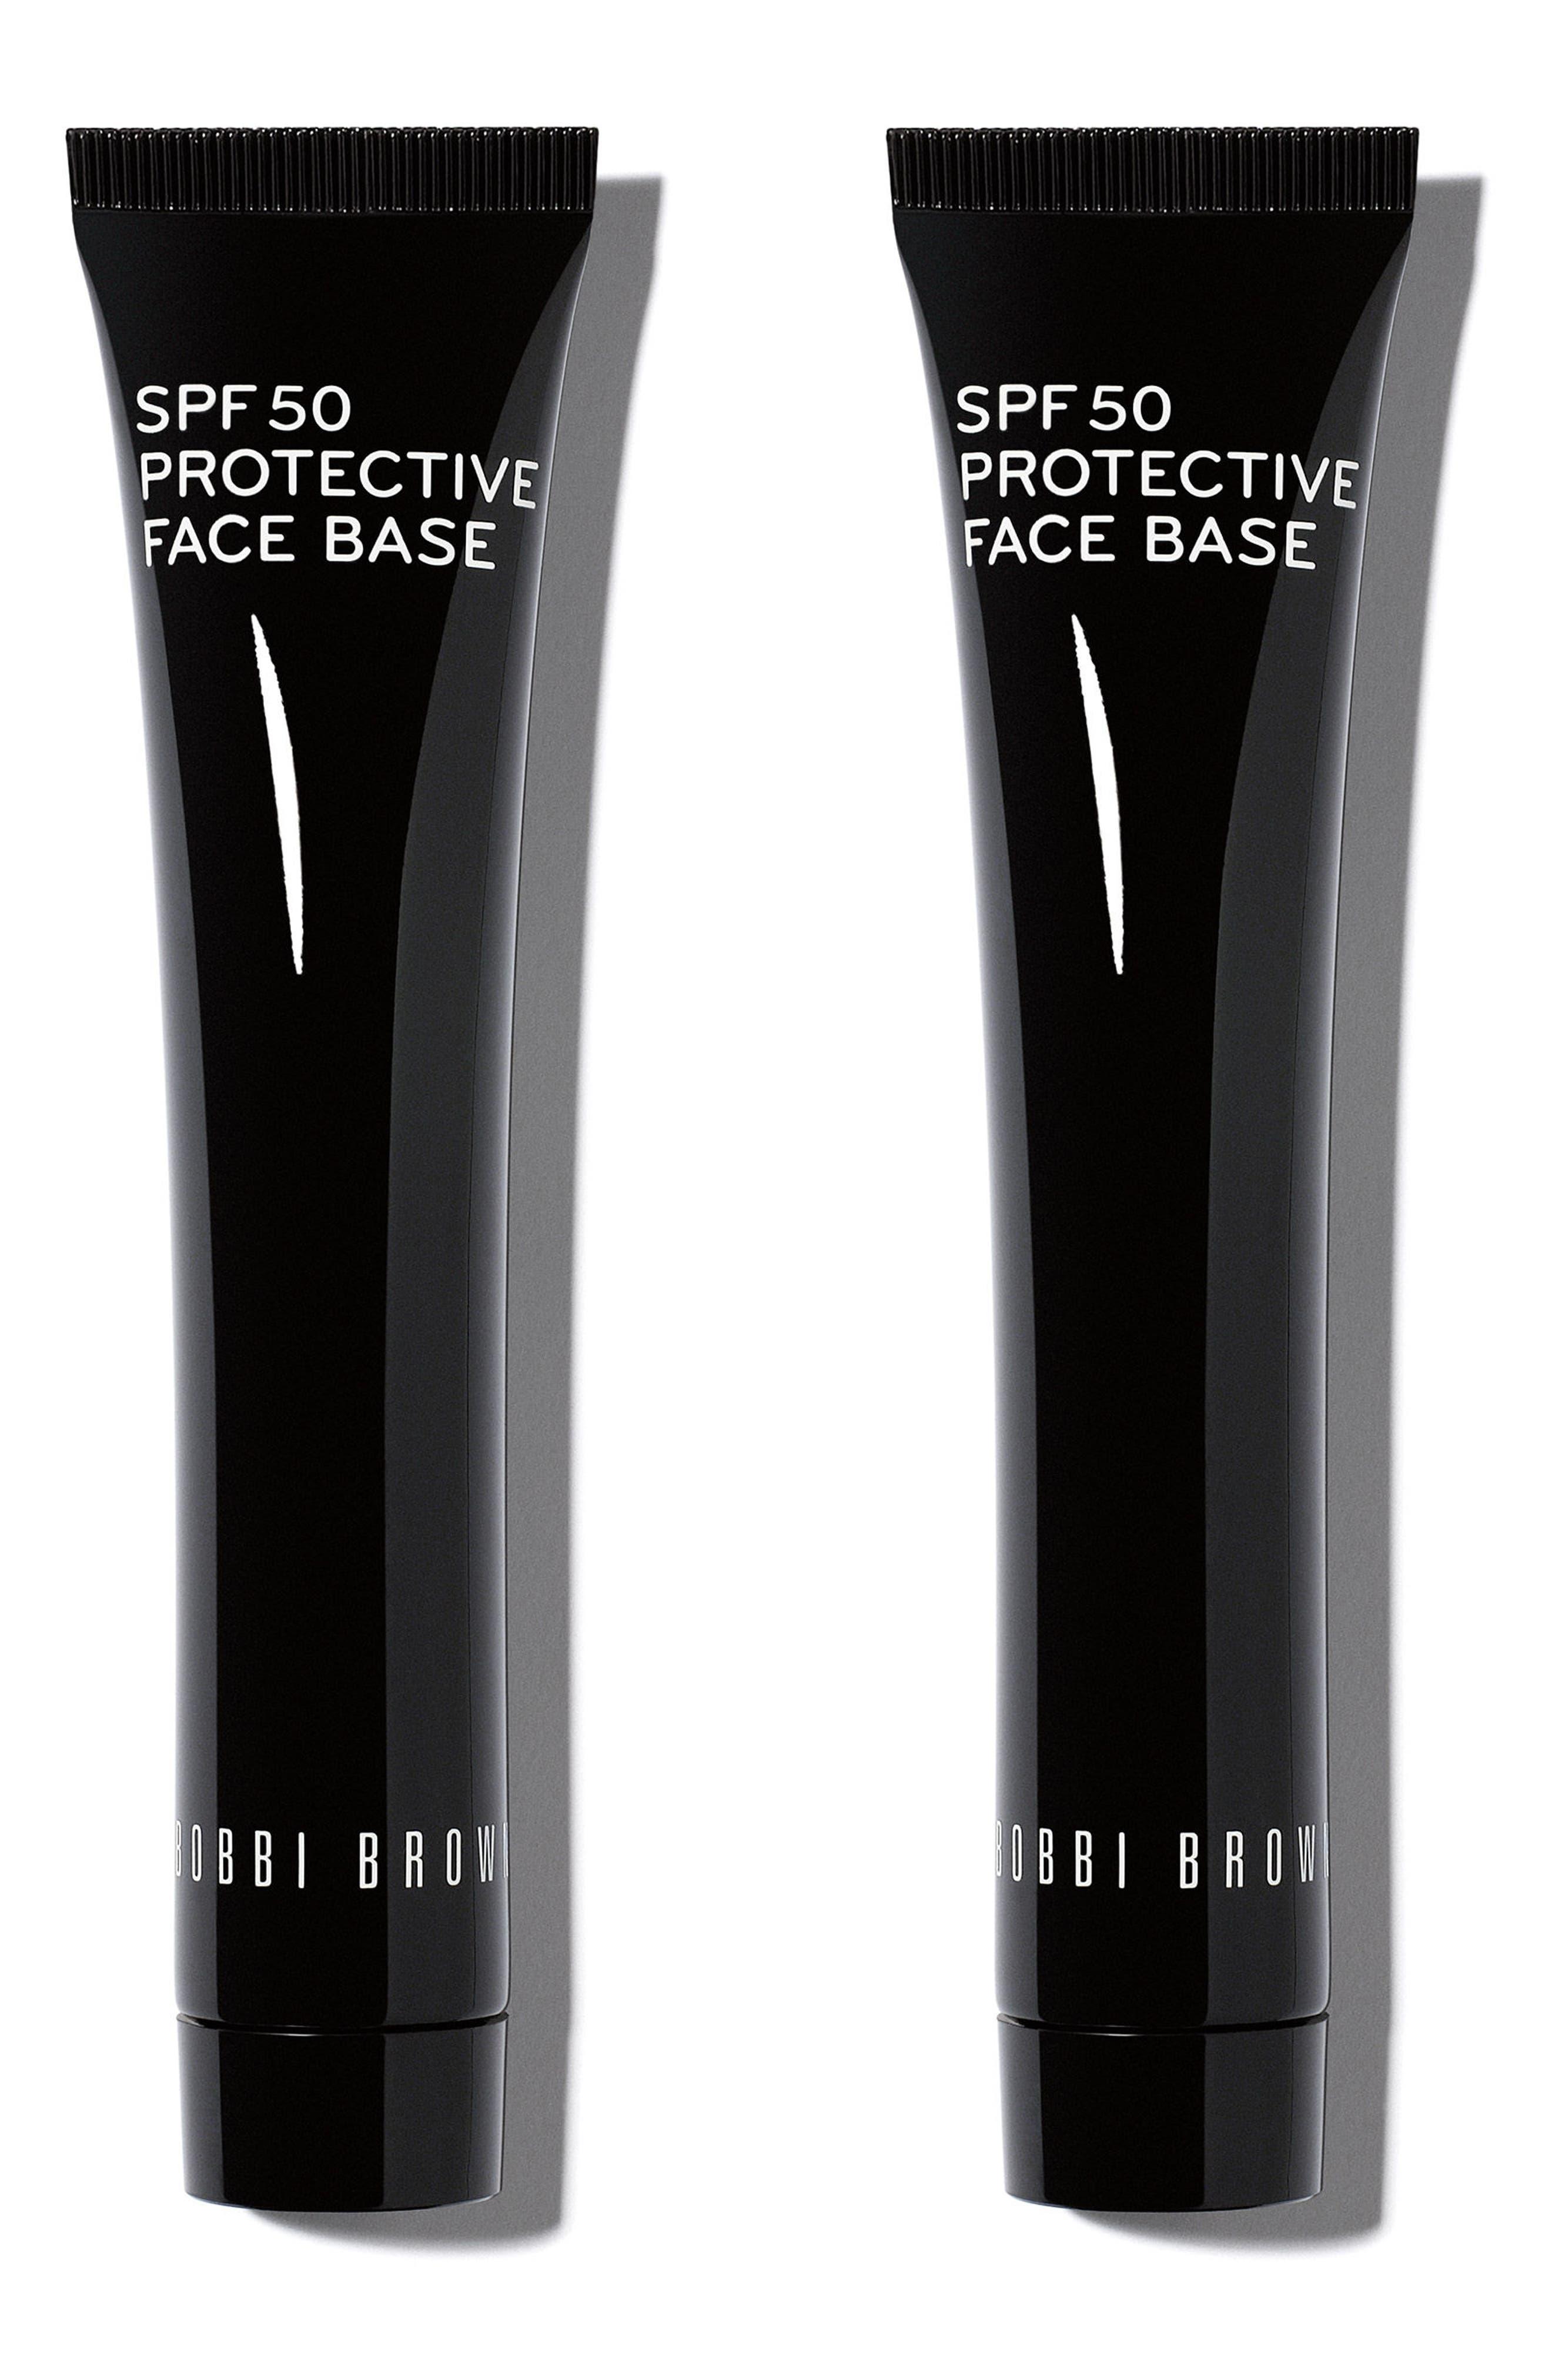 Bobbi Brown Protective Face Base SPF 50 Duo (Nordstrom Exclusive) ($86 Value)